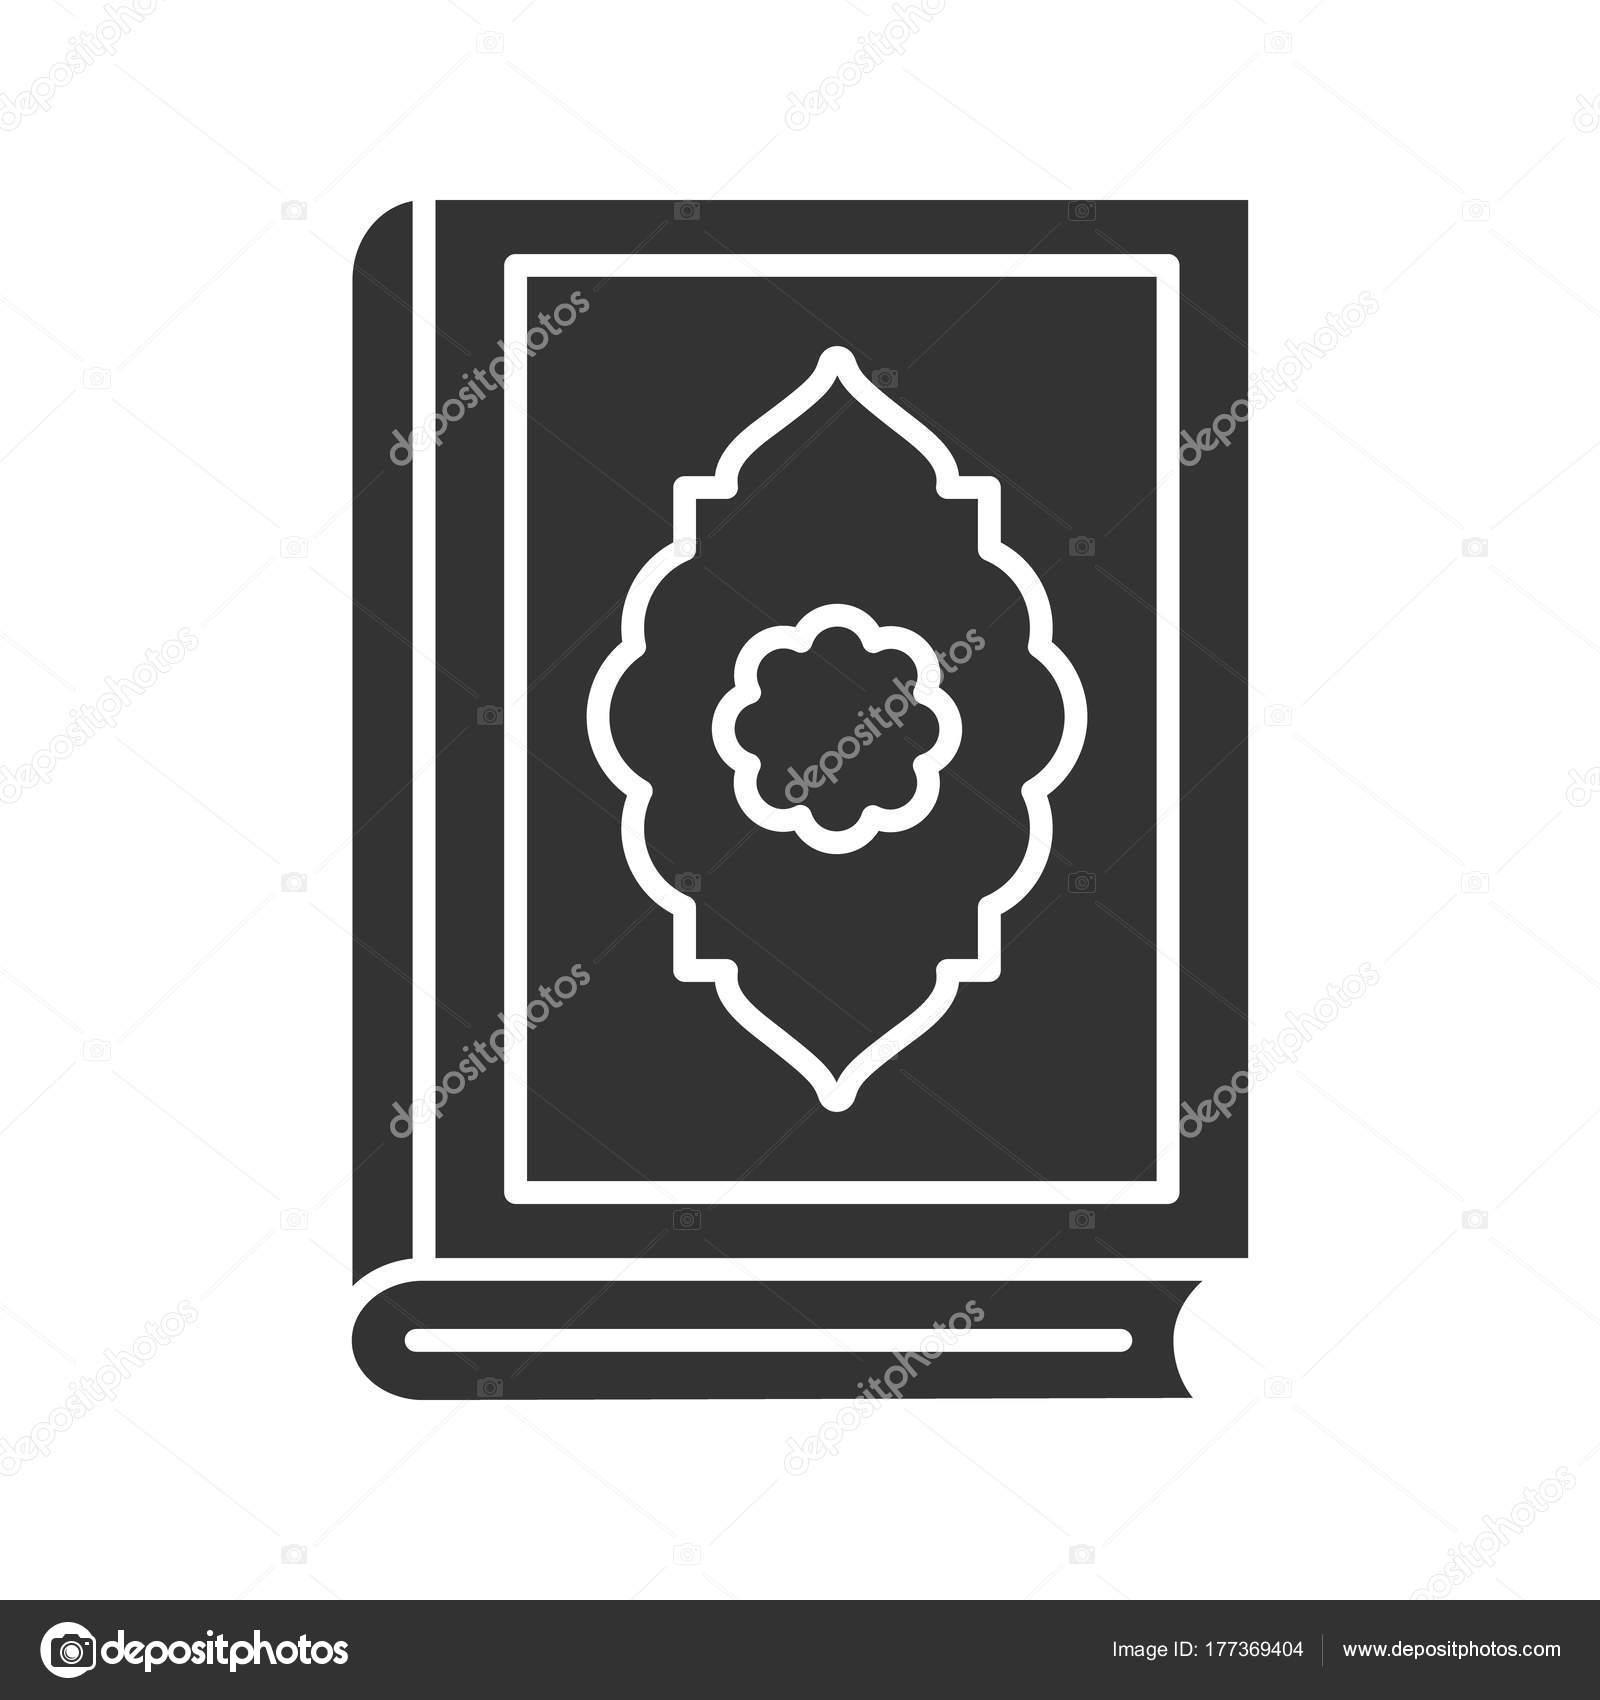 Quran book glyph icon islamic religion koran silhouette symbol quran book glyph icon islamic religion koran silhouette symbol negative stock vector biocorpaavc Images